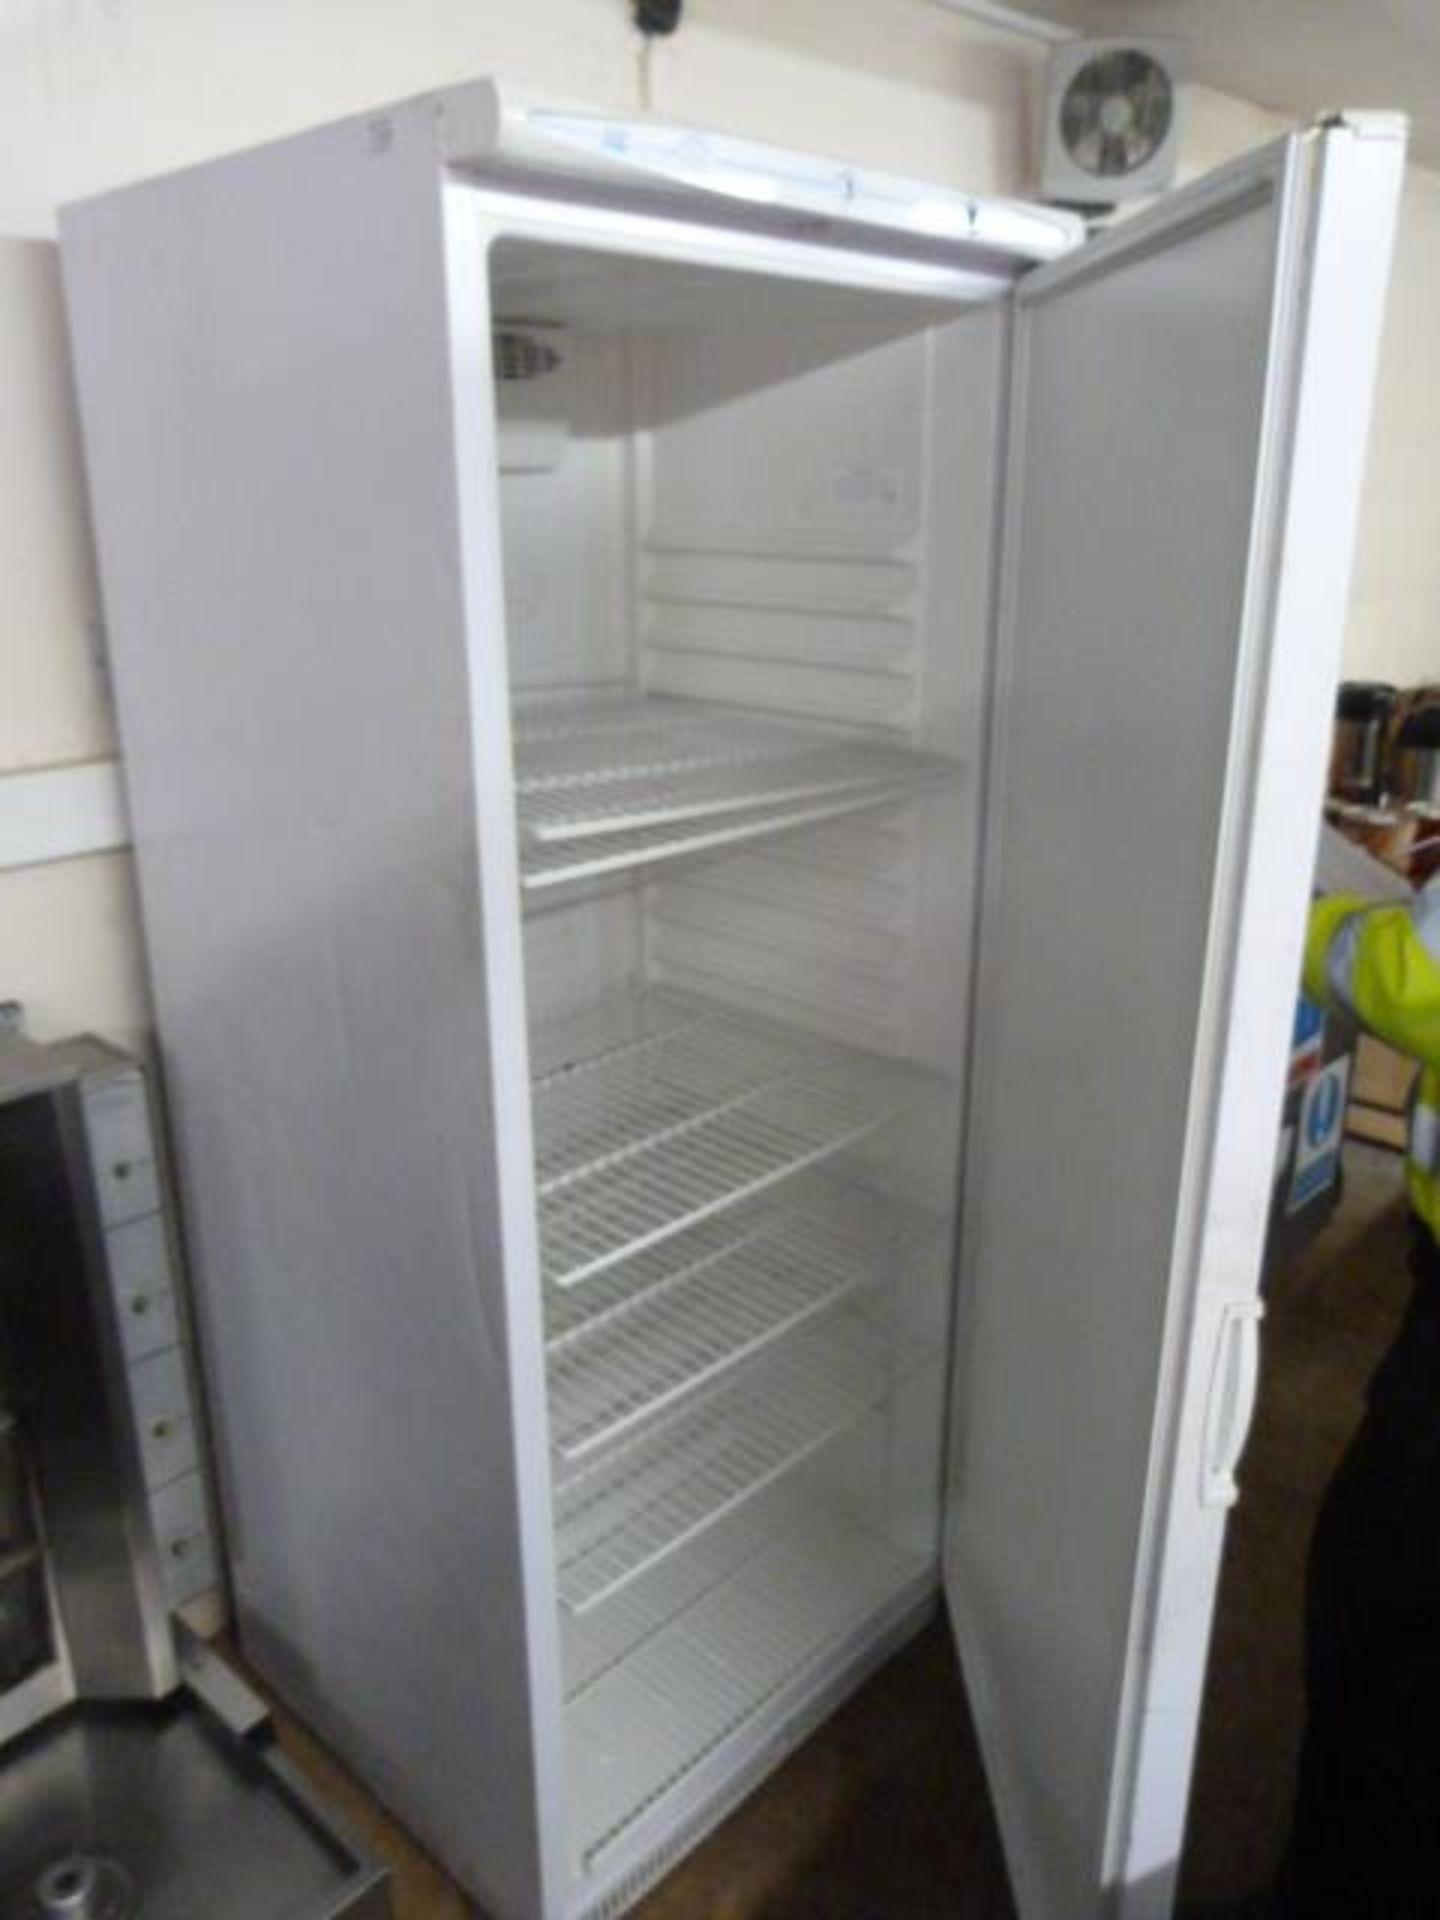 Lot 15 - Mondial Upright Refrigerator